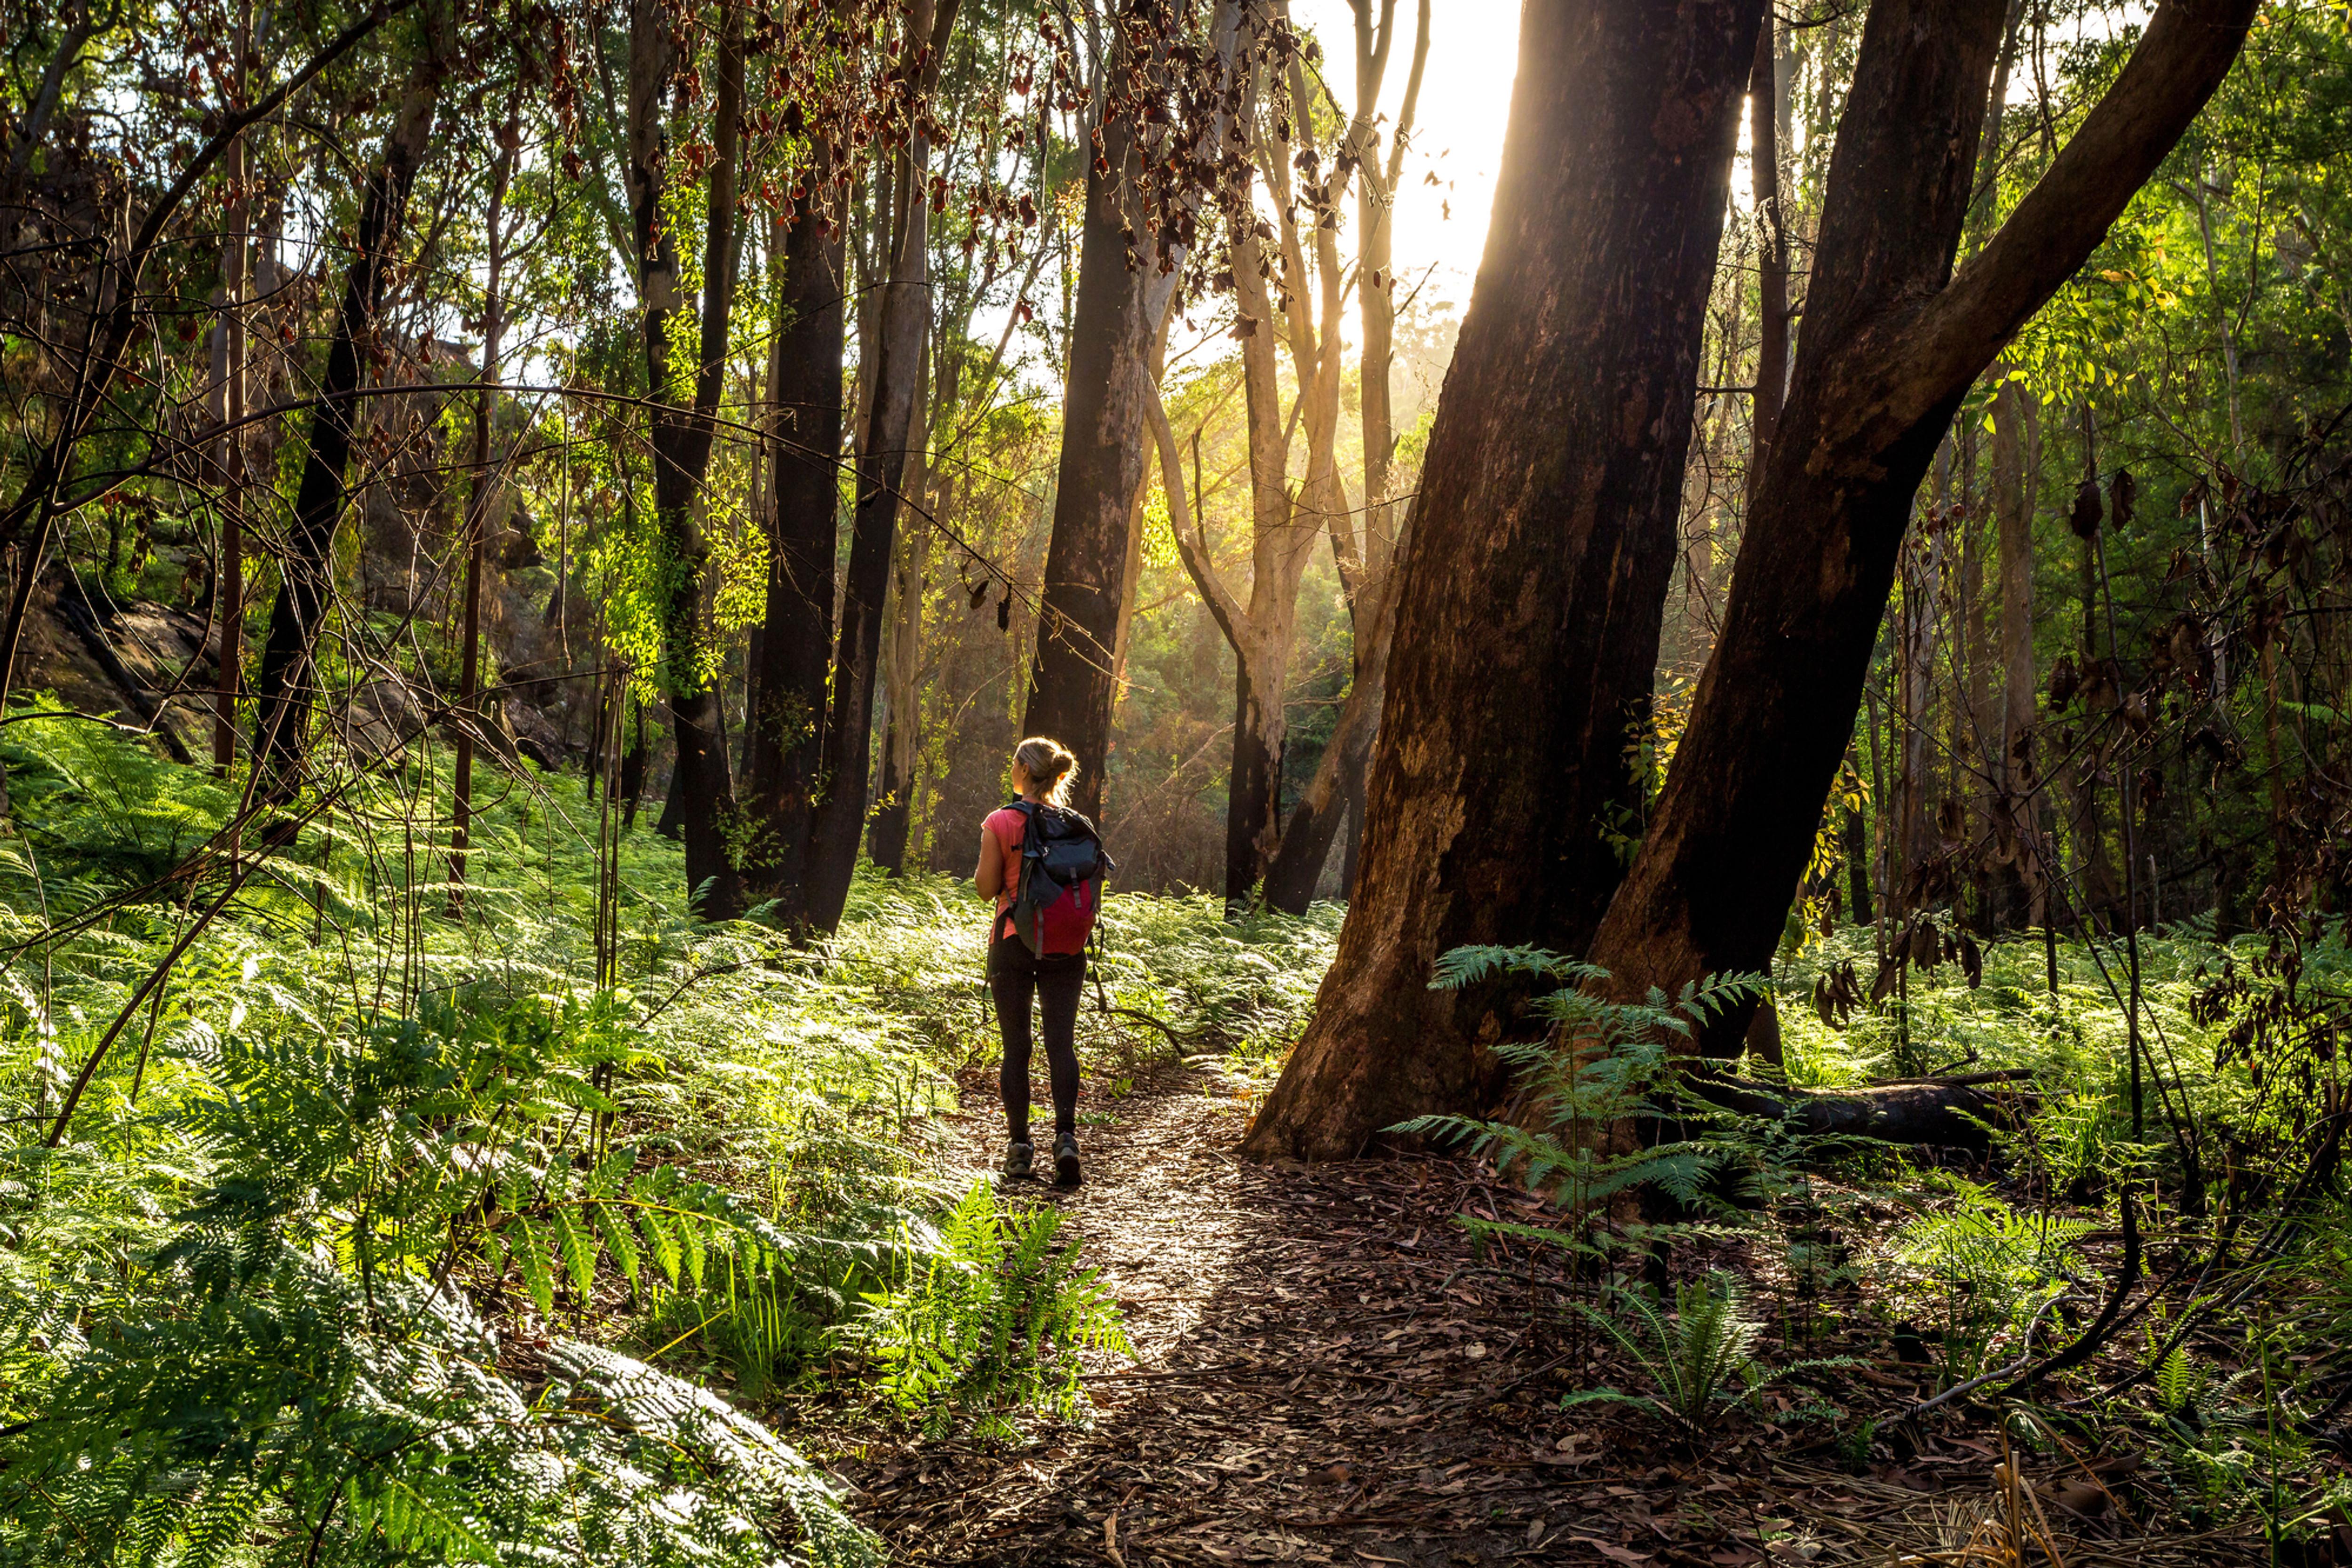 Wednesdays: Wellness in the Woods